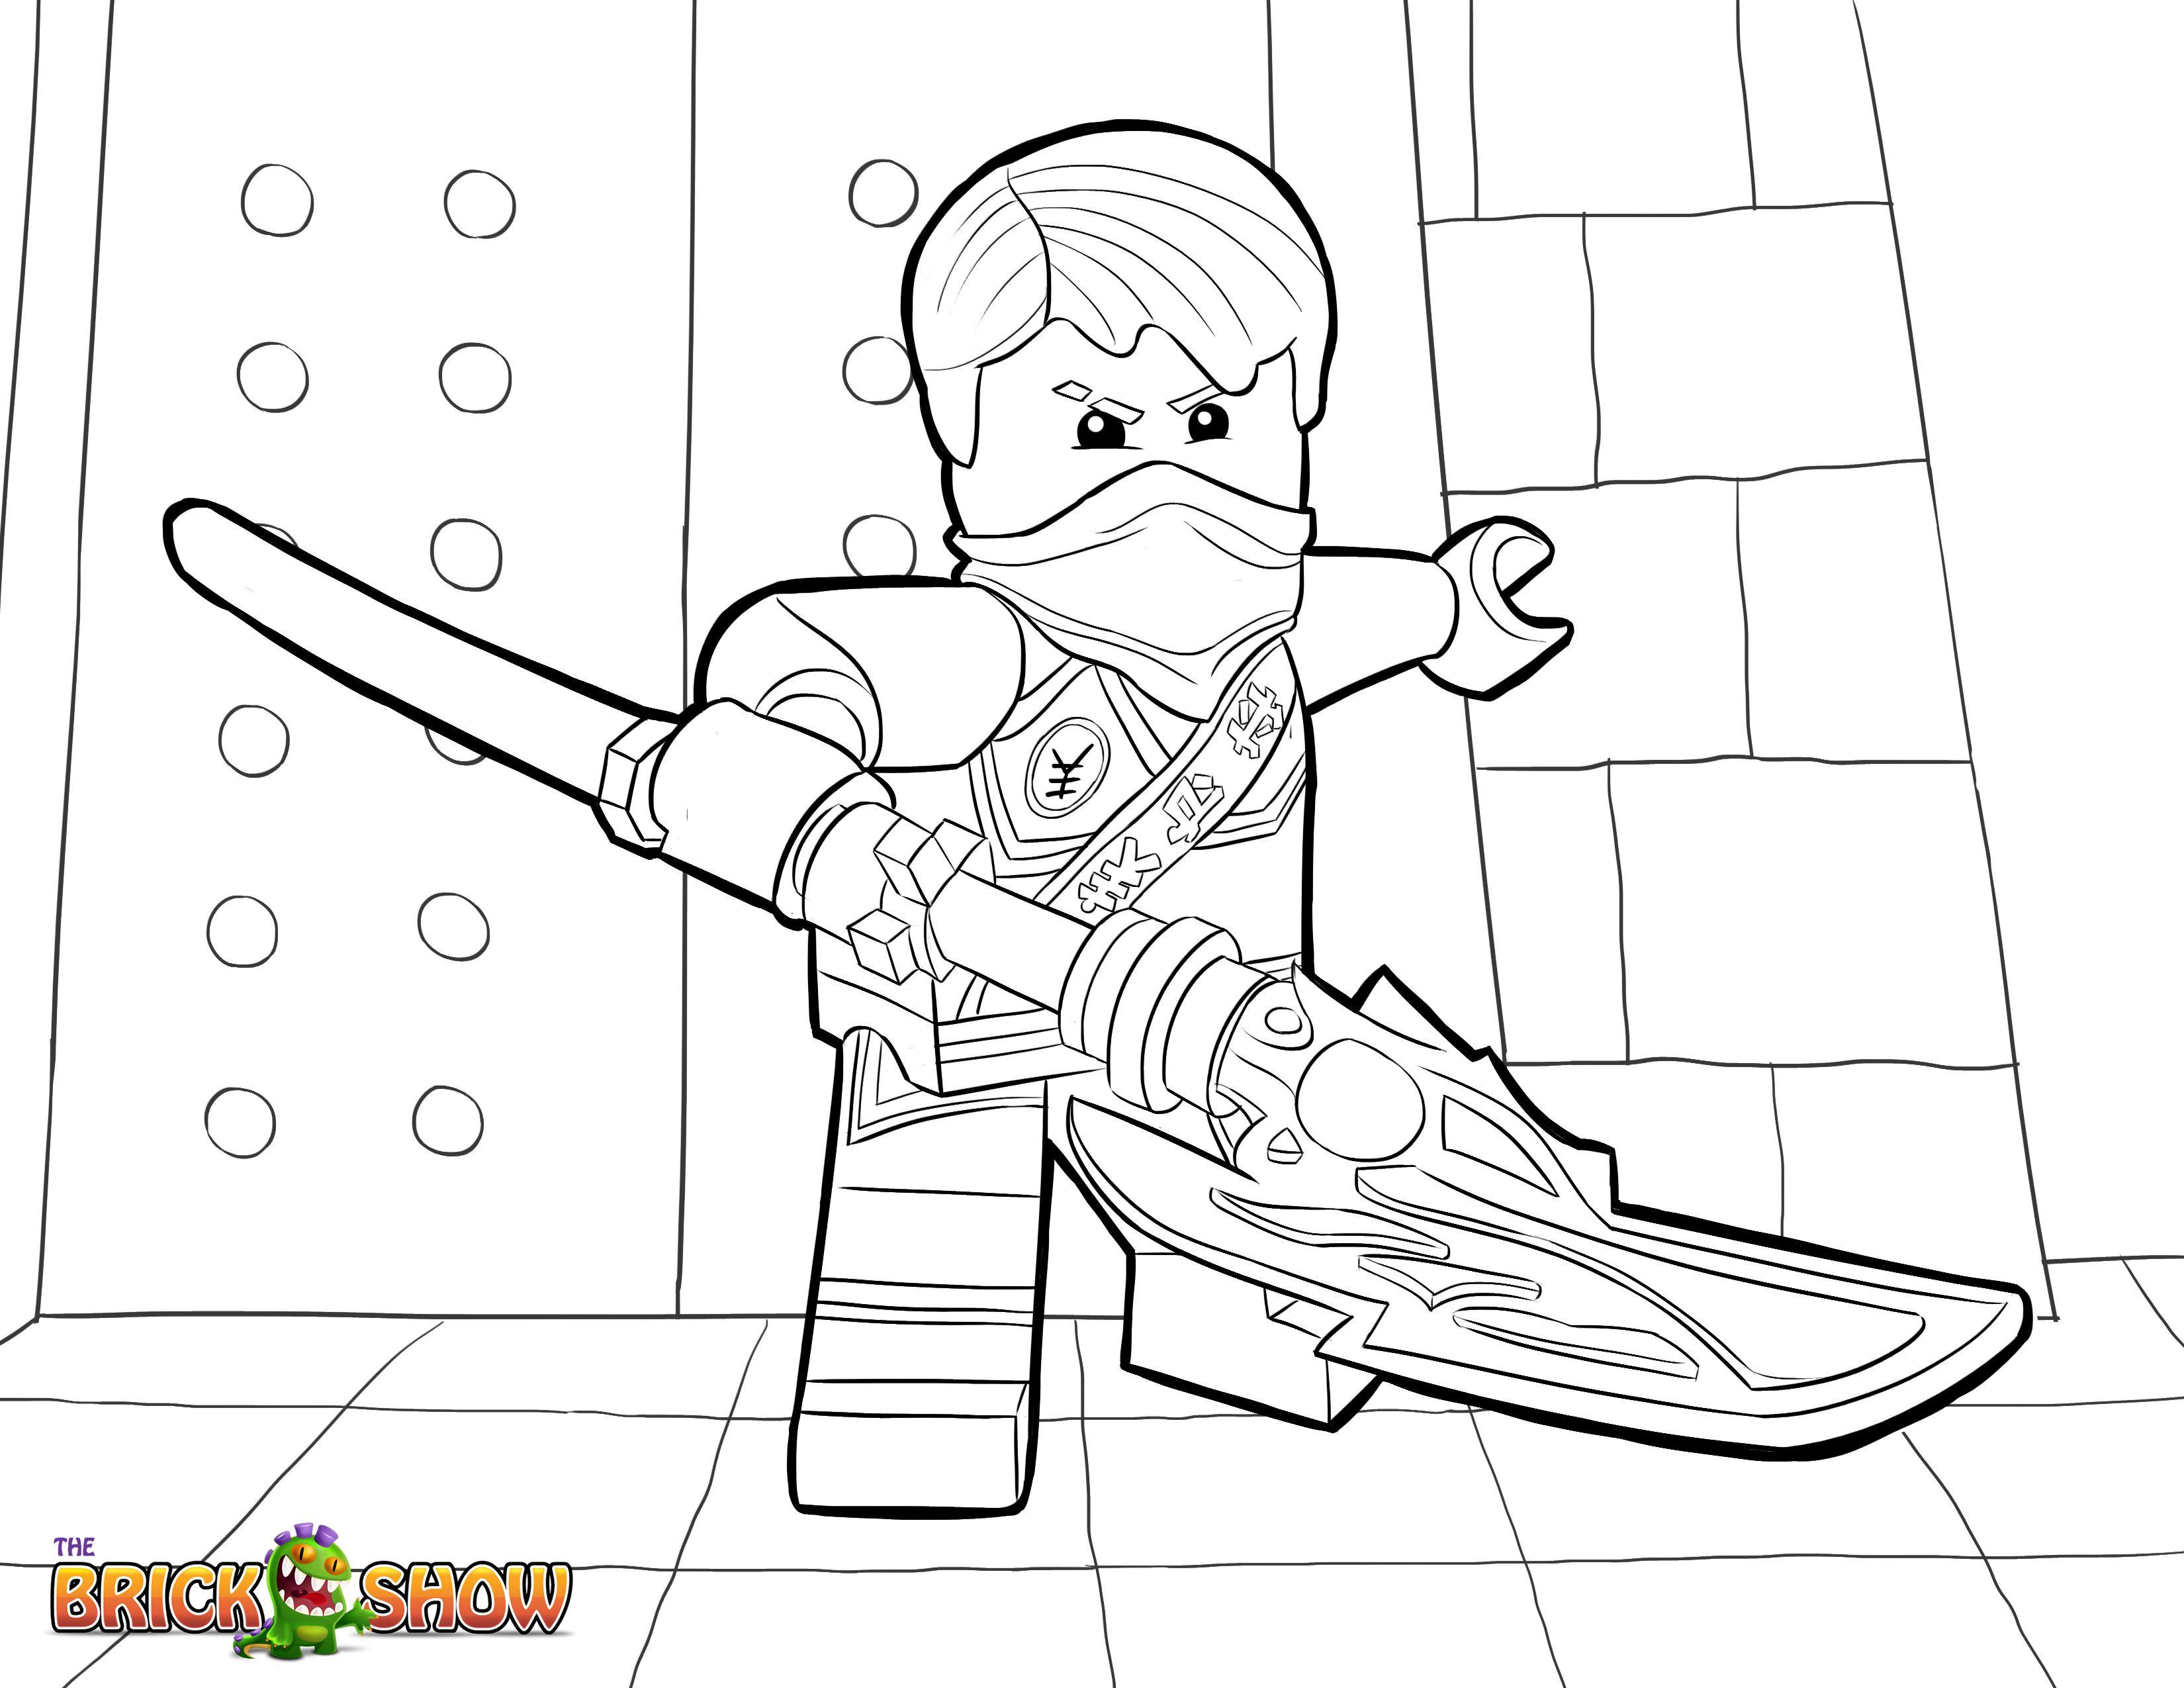 Lego Ninjago Jay Tournament Of Elements Coloring Page Printable Sheet Lego Ninjago Ninjago Coloring Pages Lego Coloring Pages Coloring Pages